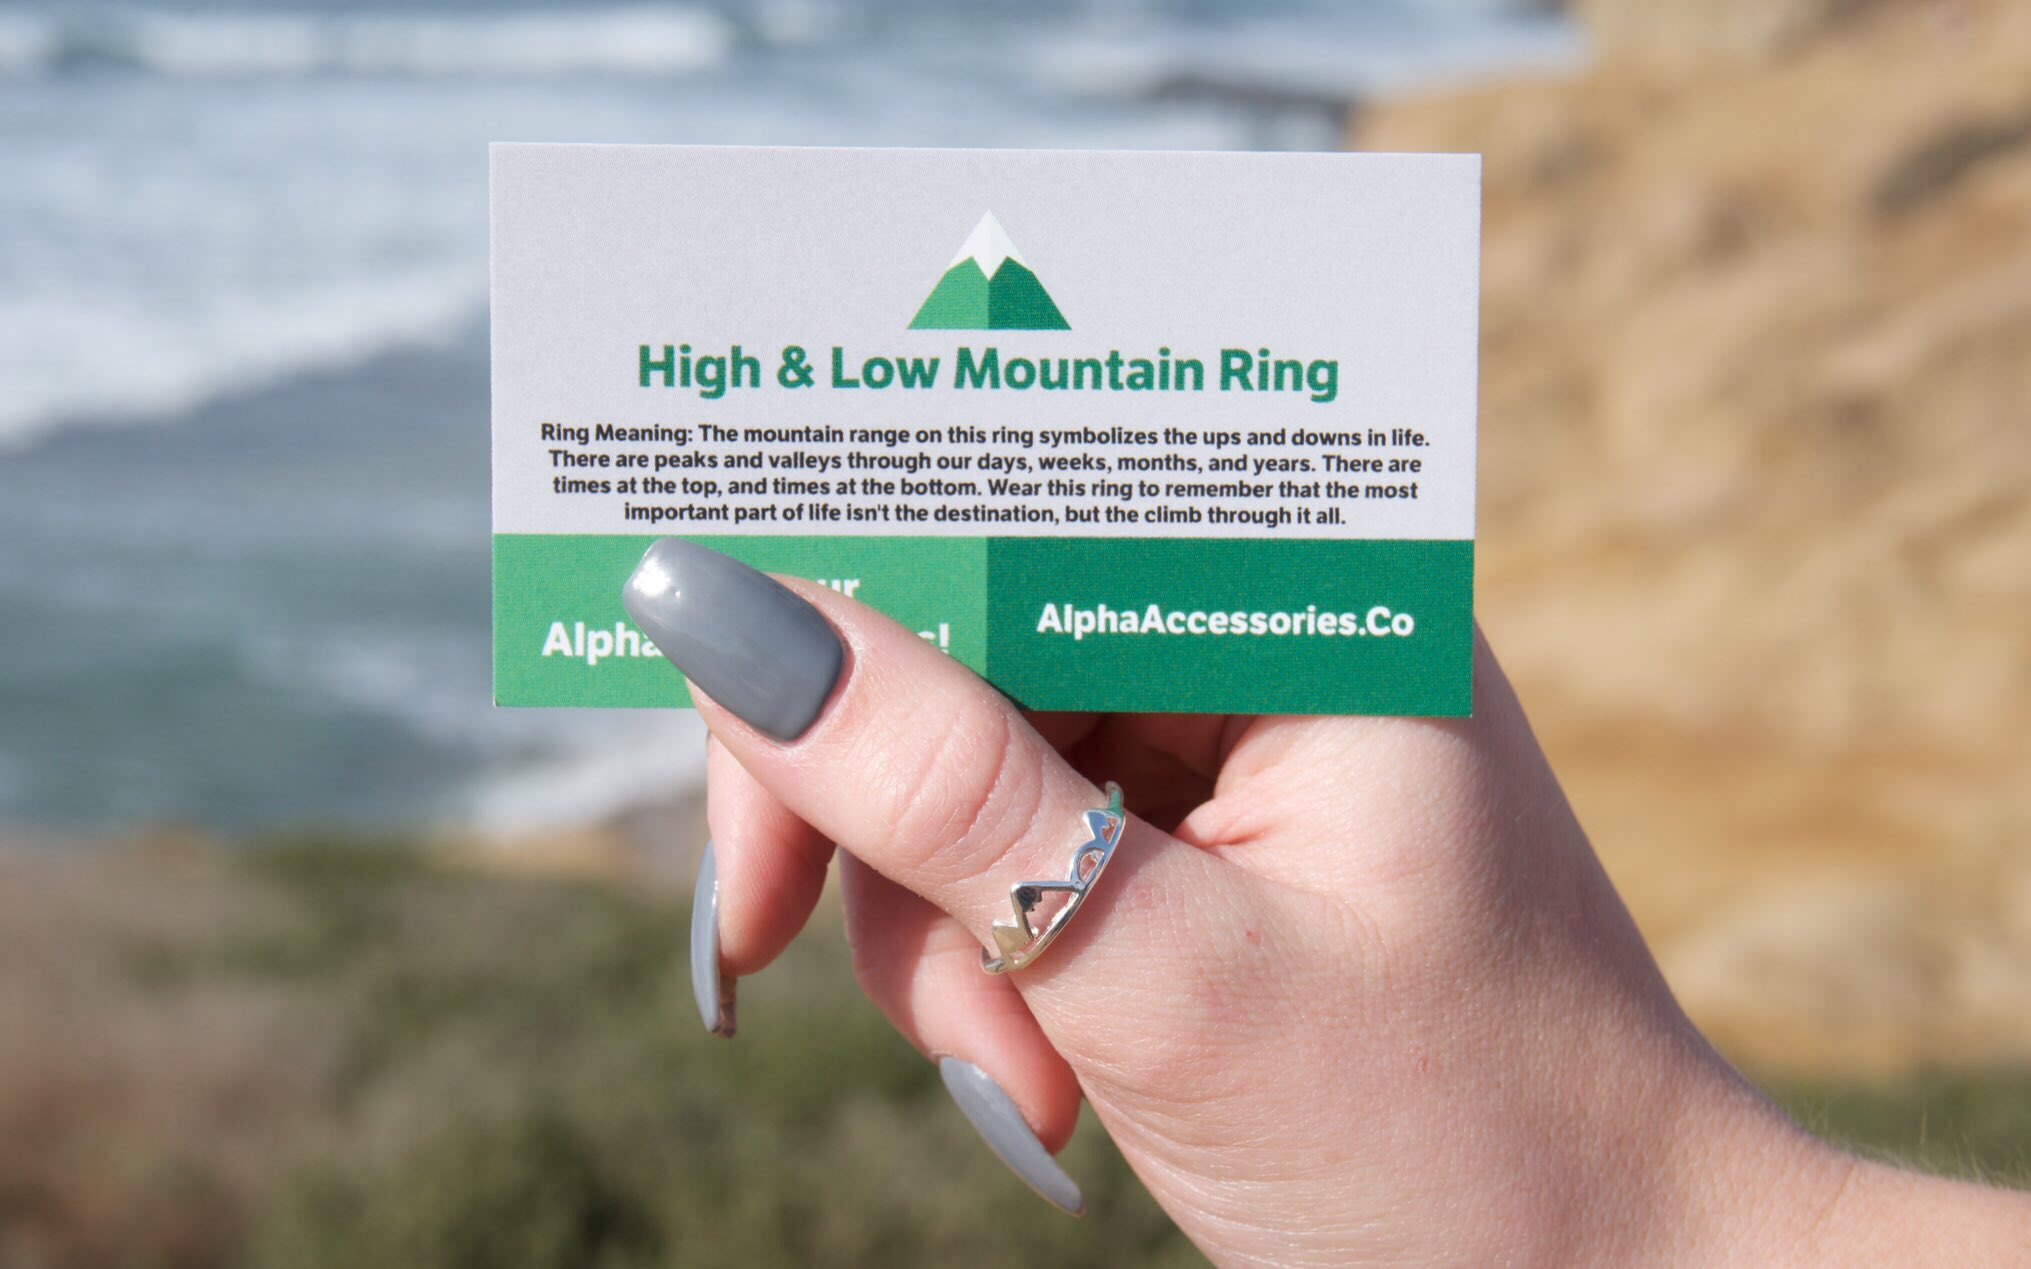 RT @BEFlTMOTlVATION: Loving my high & low mountain ring from https://t.co/6QN7pgspDQ https://t.co/rwvmXv8KrJ